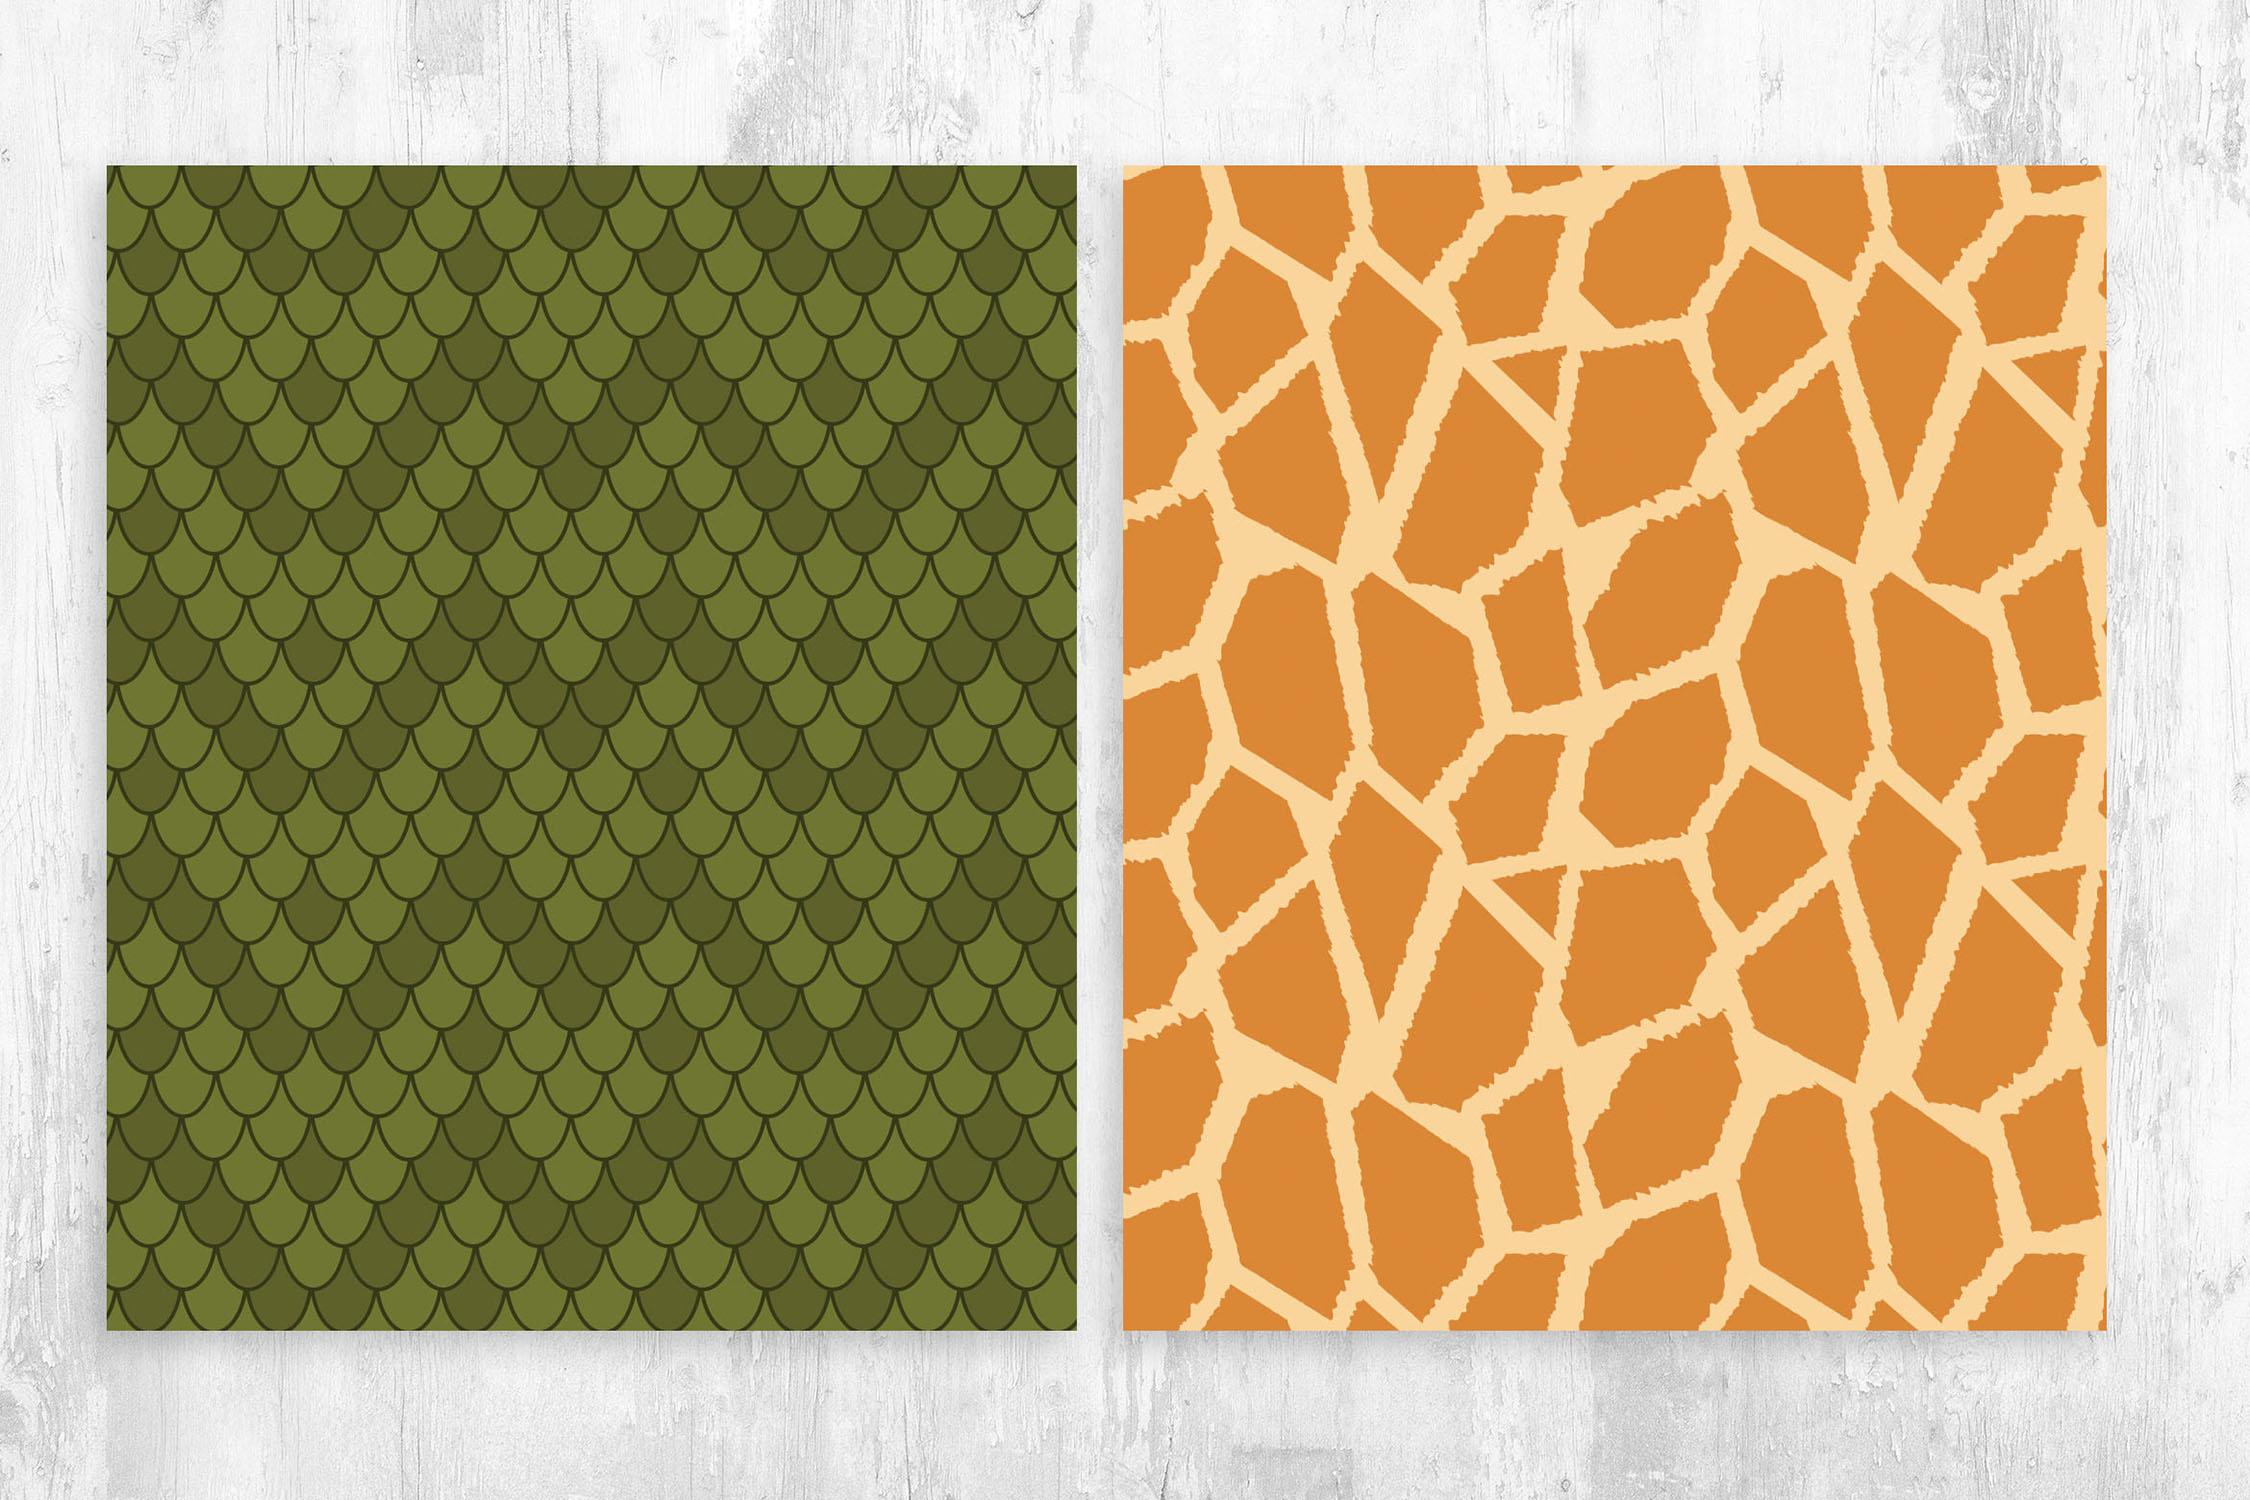 Lizard & Giraffe Skin Pattern for Photoshop & Illustrator